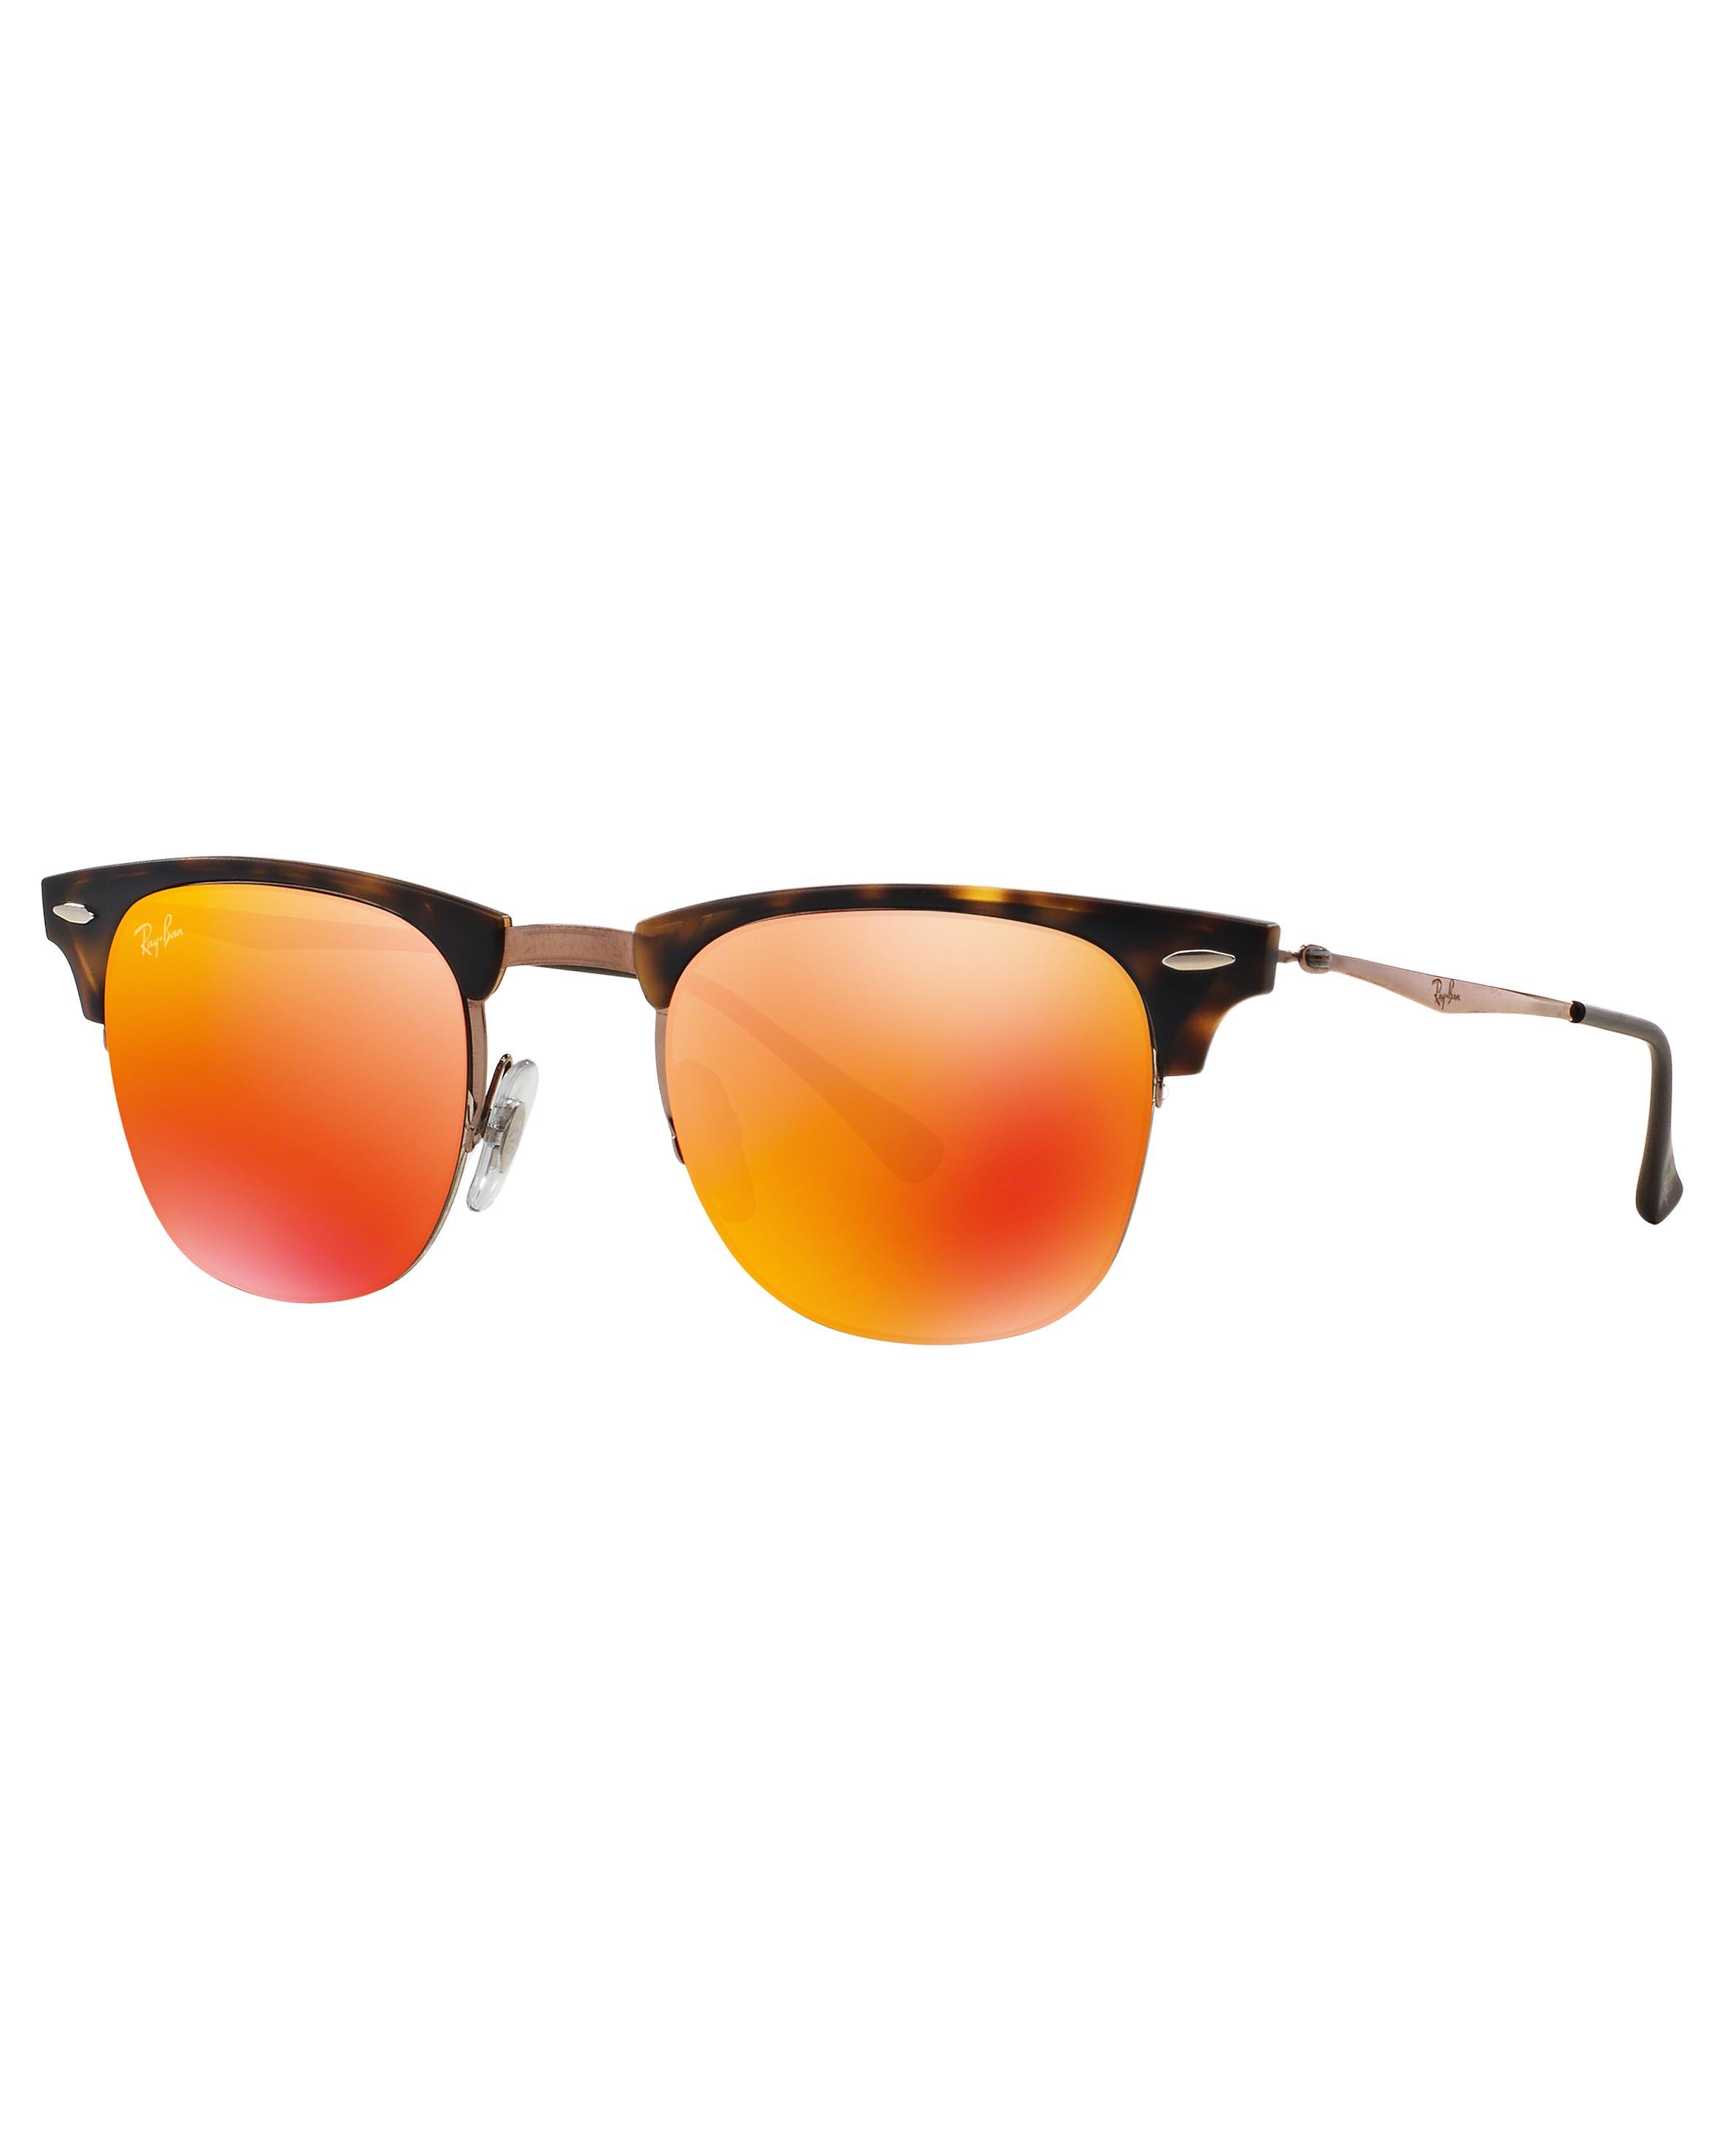 cheap ray ban sunglasses melbourne